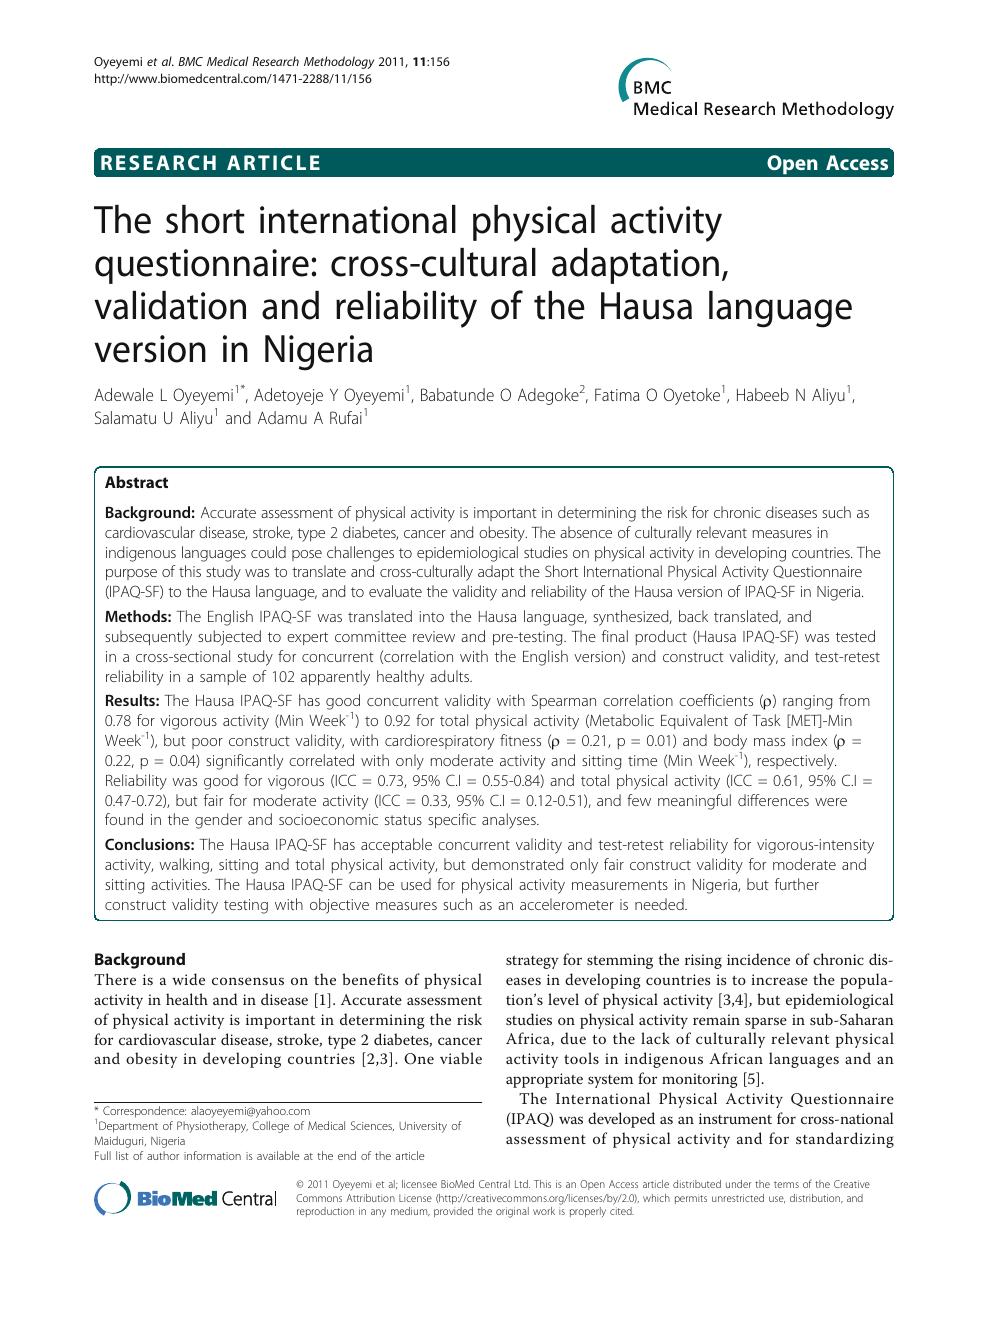 The short international physical activity questionnaire: cross